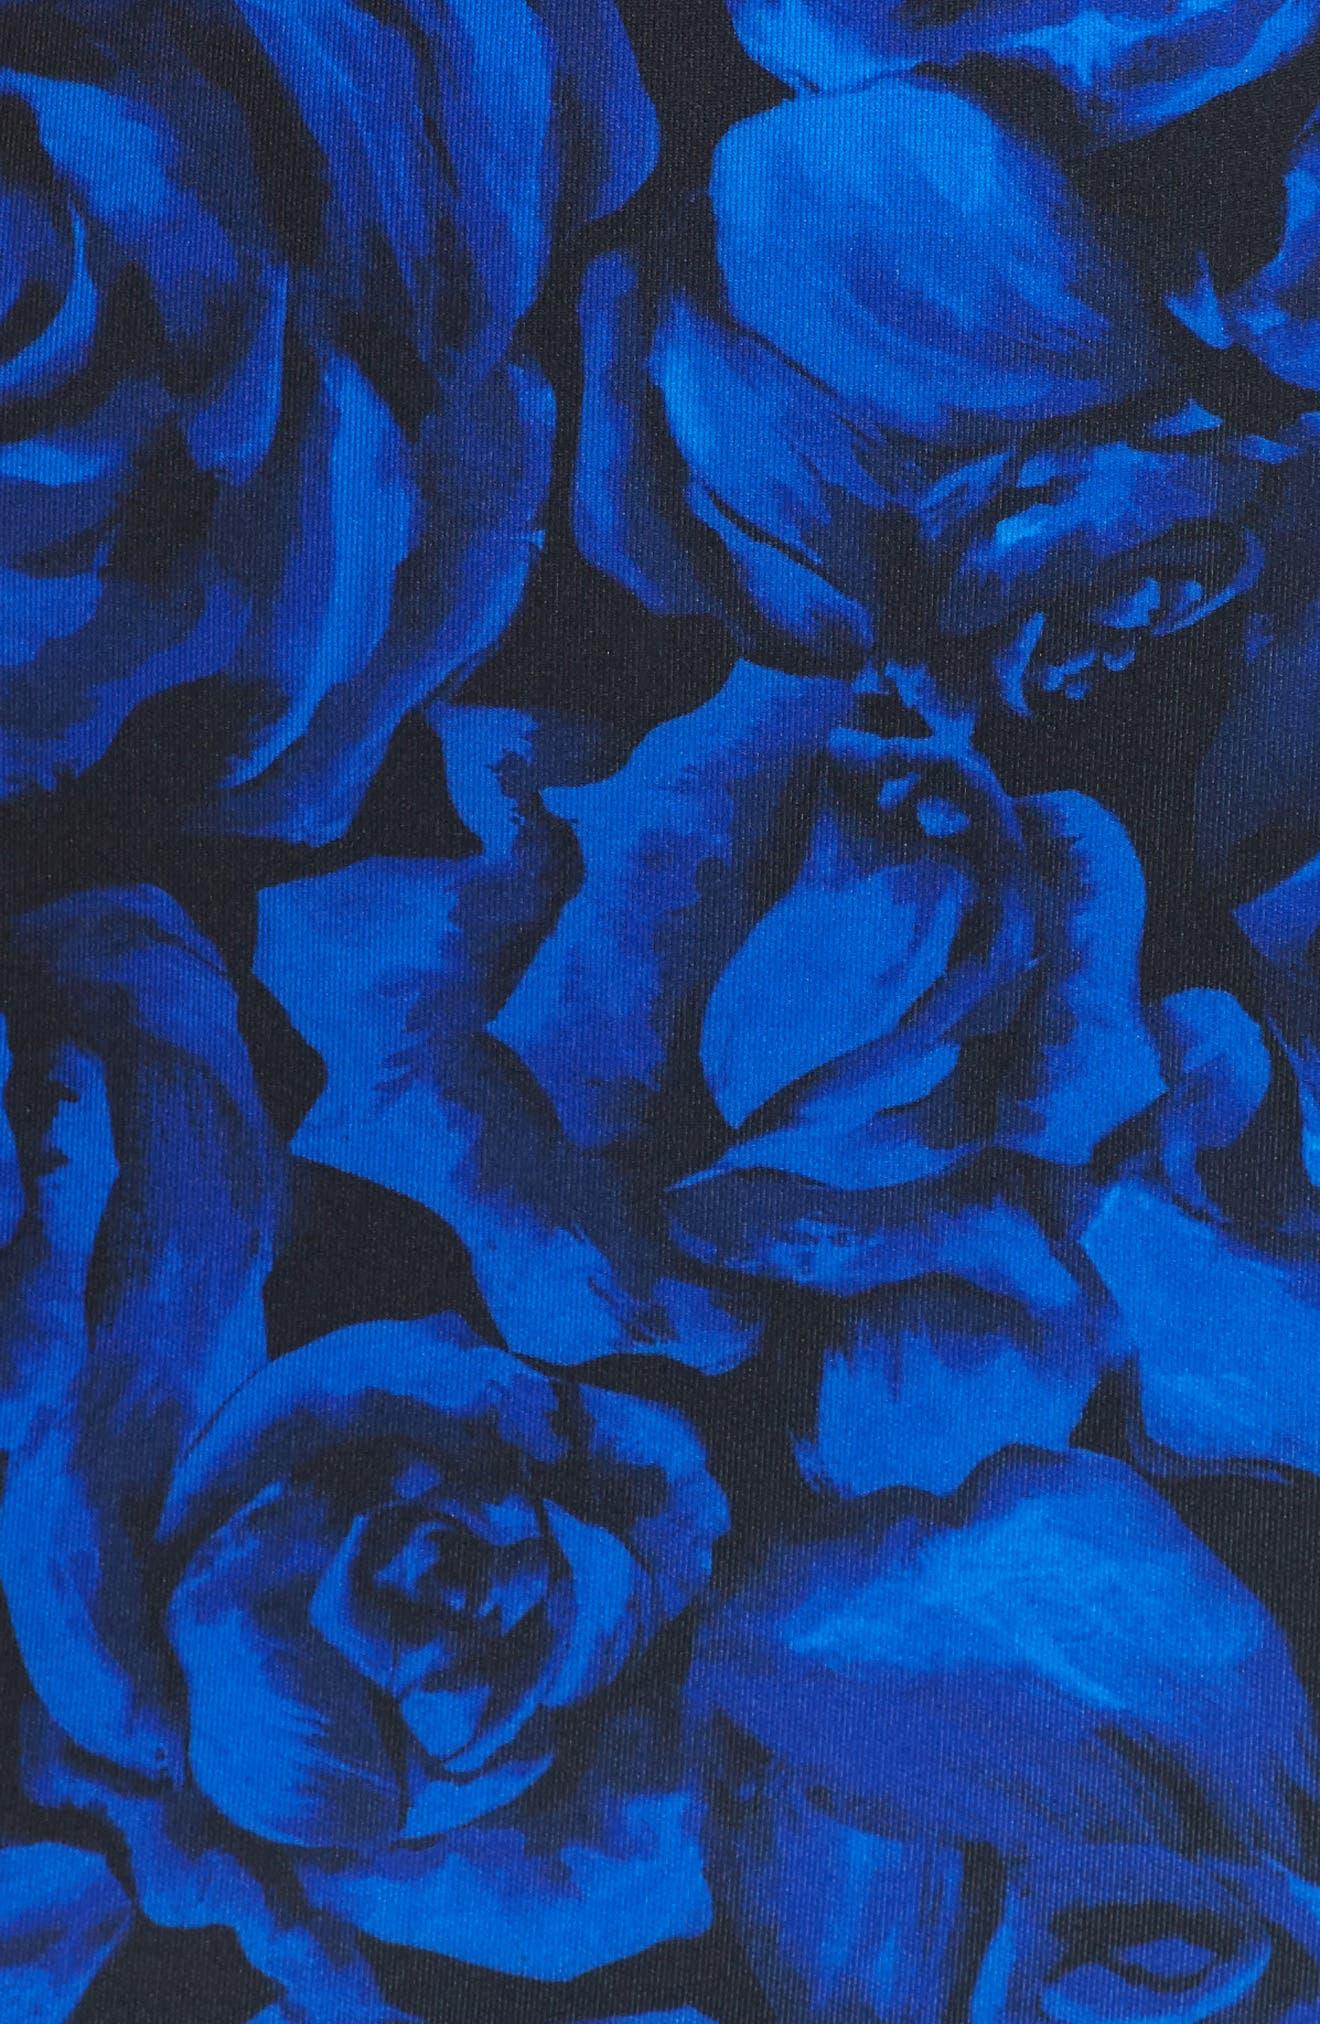 Floral Print Body-Con Dress,                             Alternate thumbnail 5, color,                             ROYAL/ BLACK